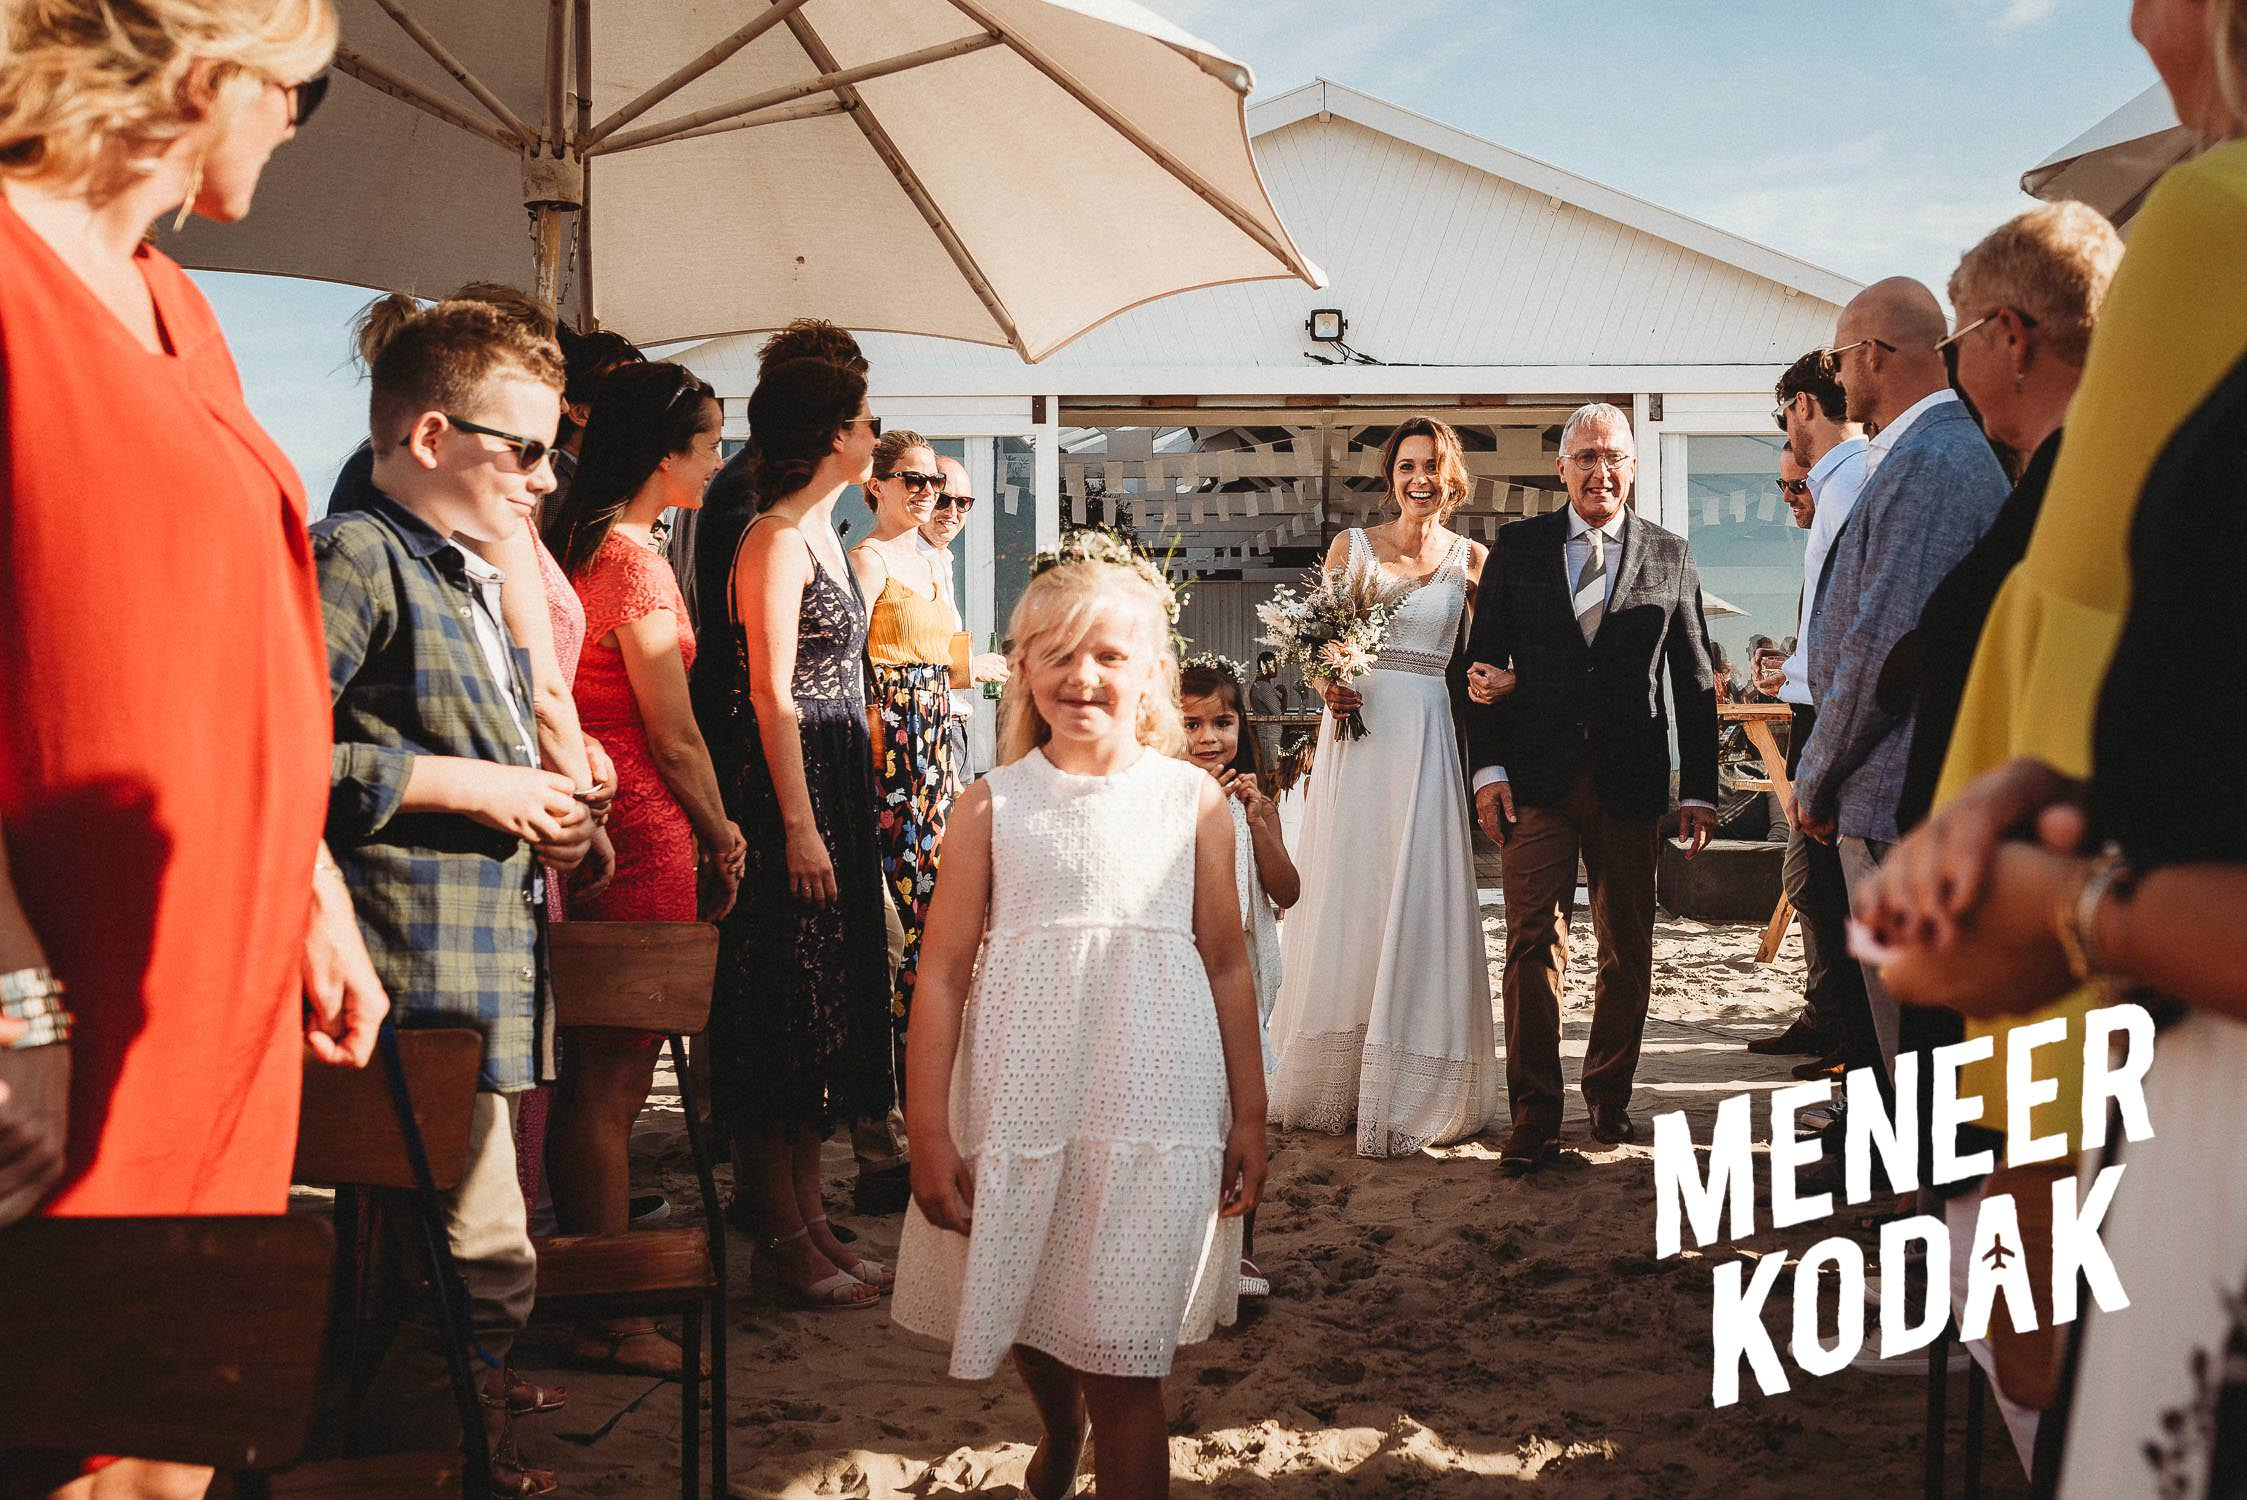 Meneer Kodak - Strandbruiloft - Noordwijk - K&A-080.jpg